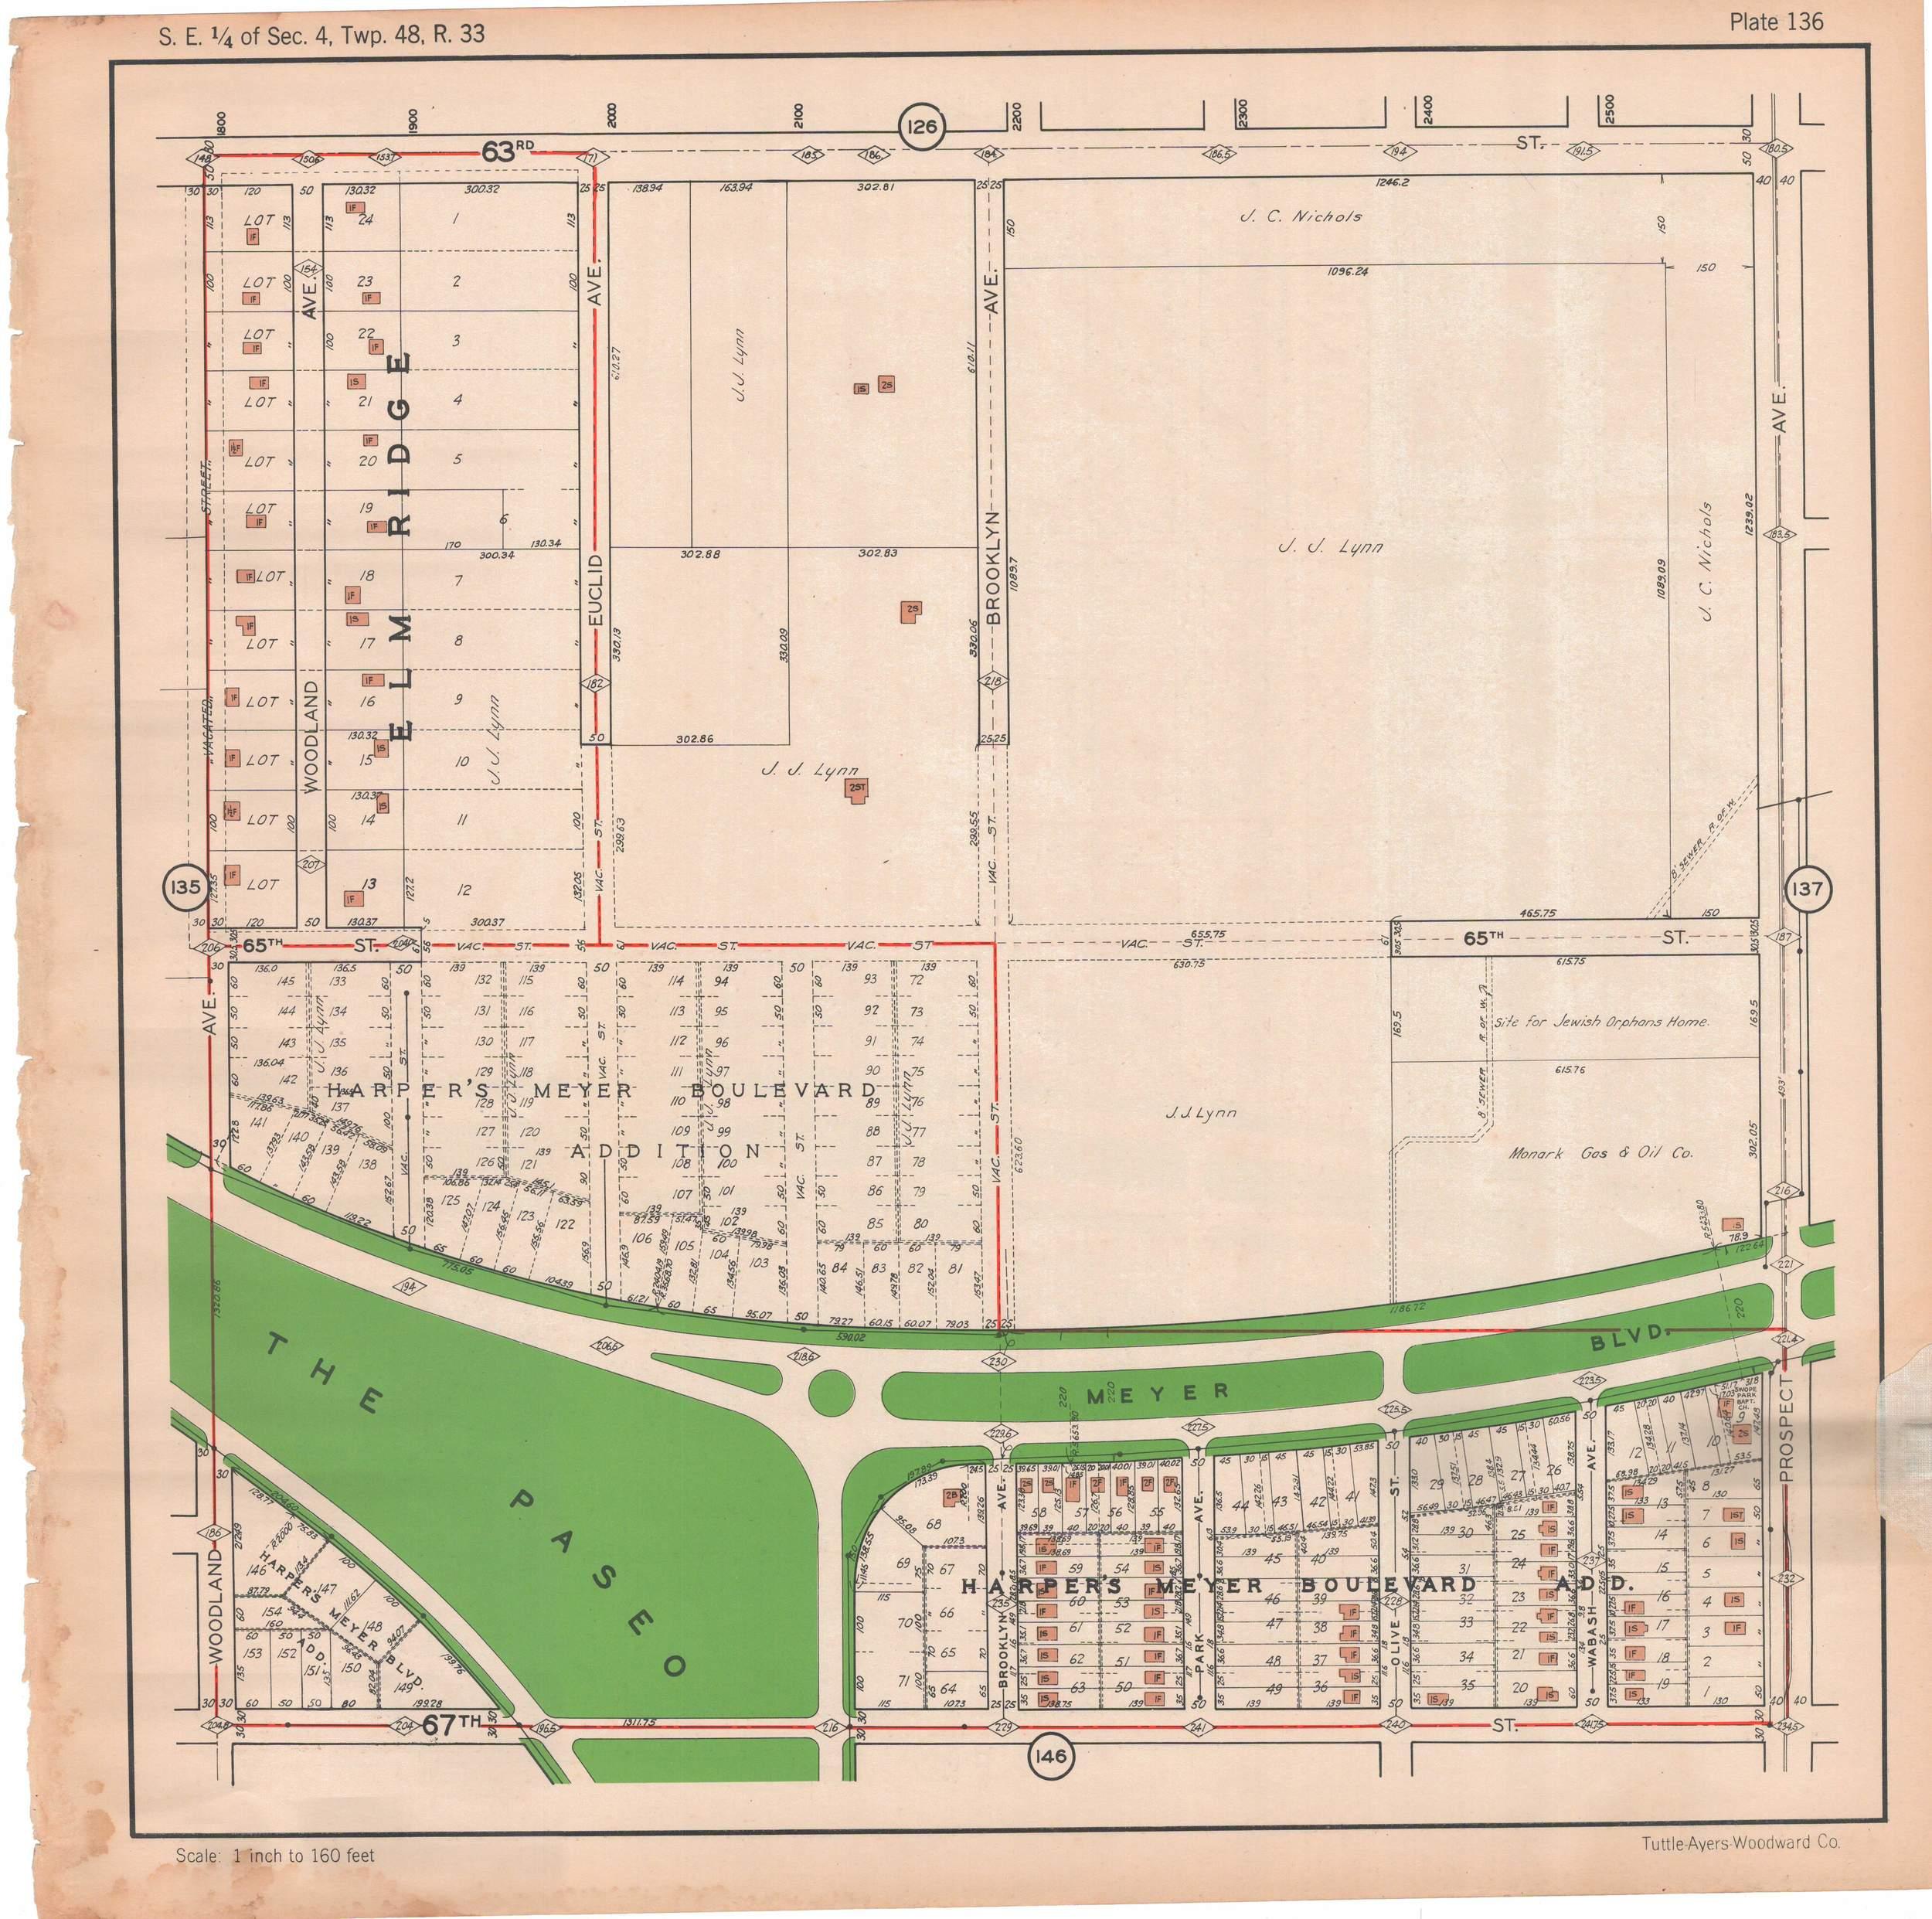 1925 TUTTLE_AYERS_Plate_136.JPG